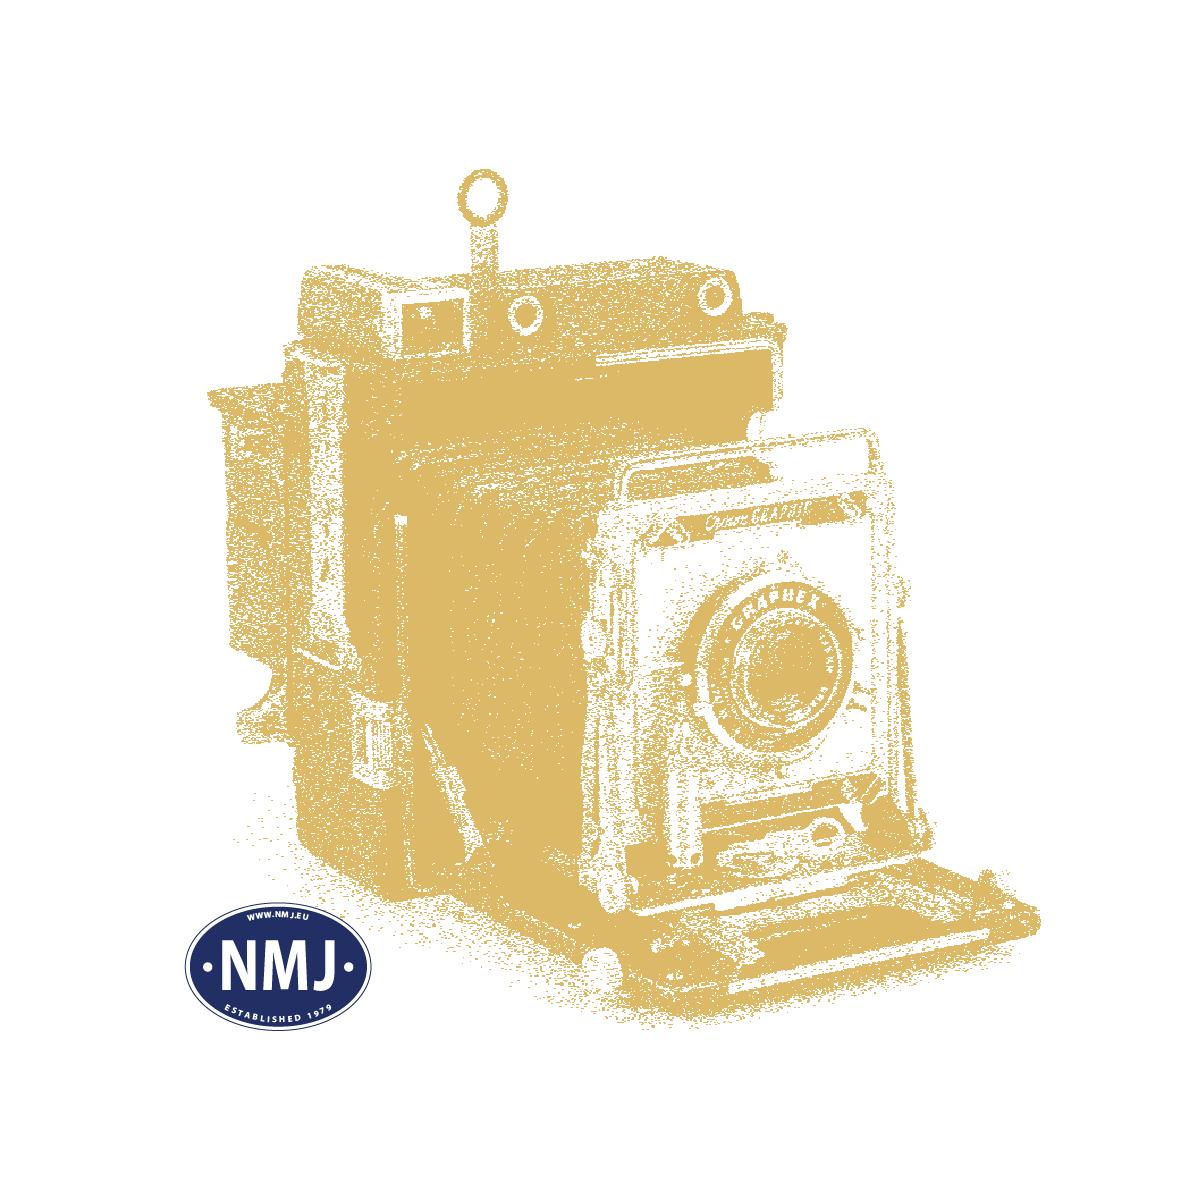 MBR55-1009 - Gressmatte #9, 30 x 40 Cm